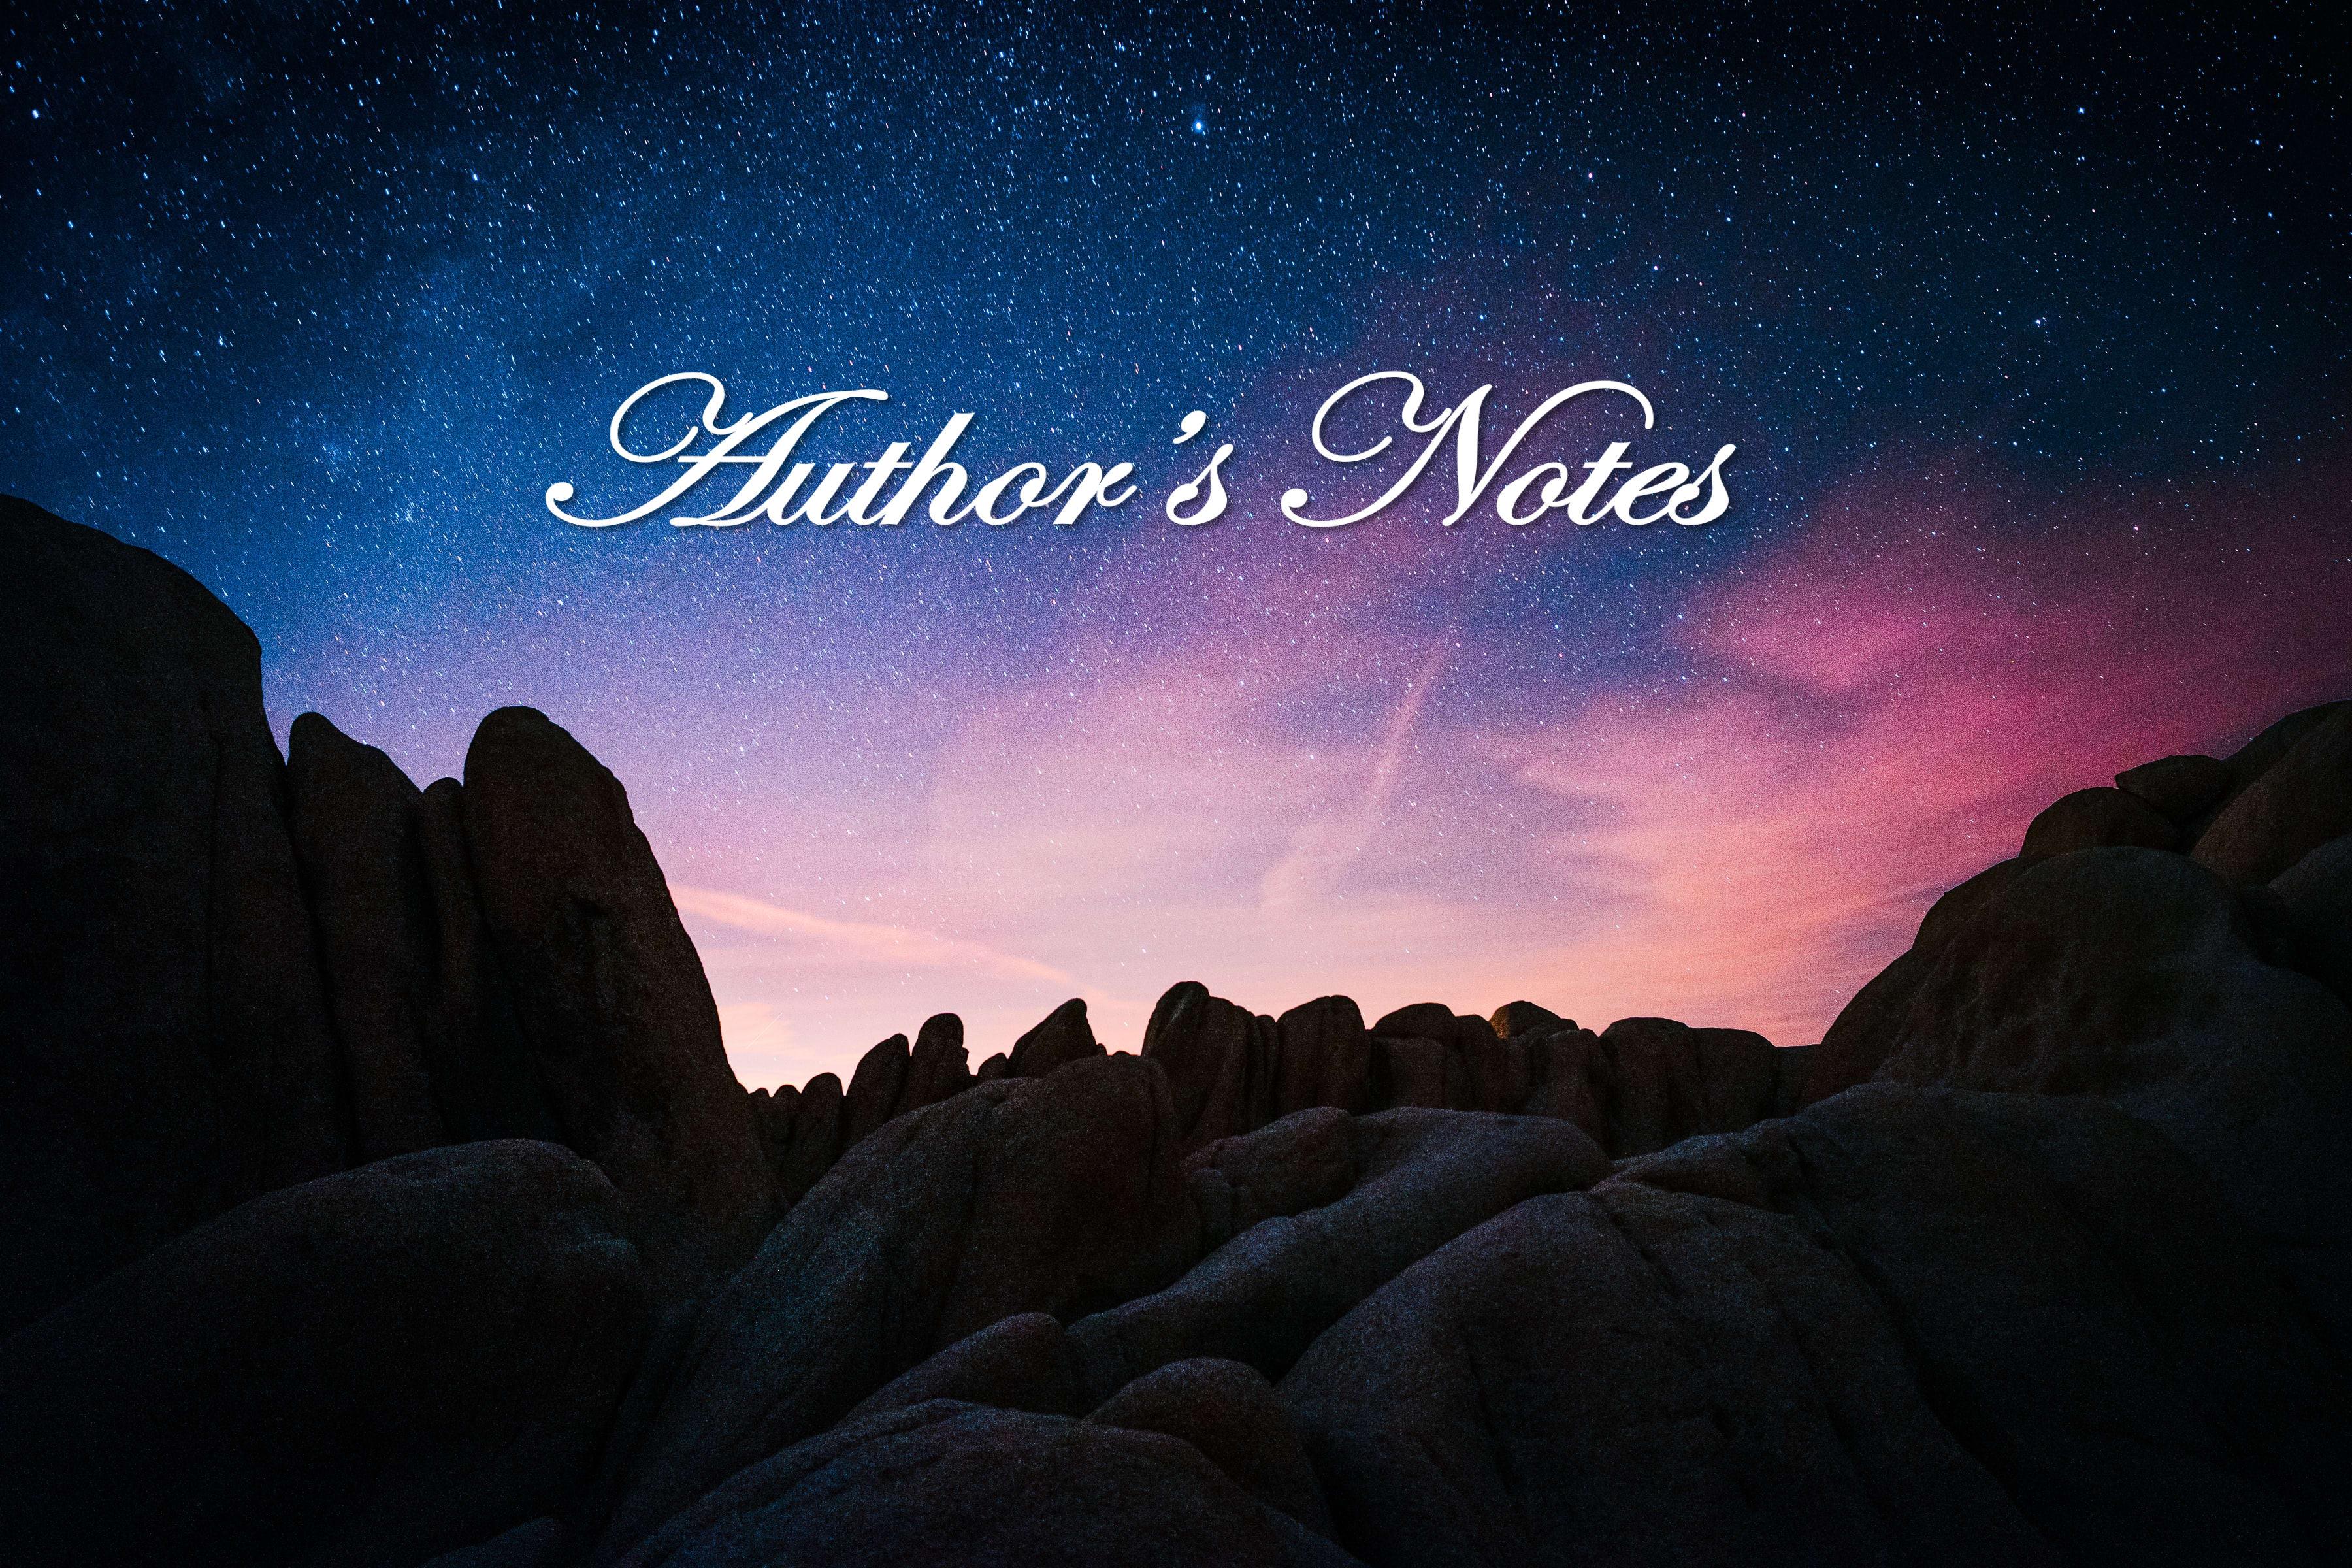 Yoav's notes